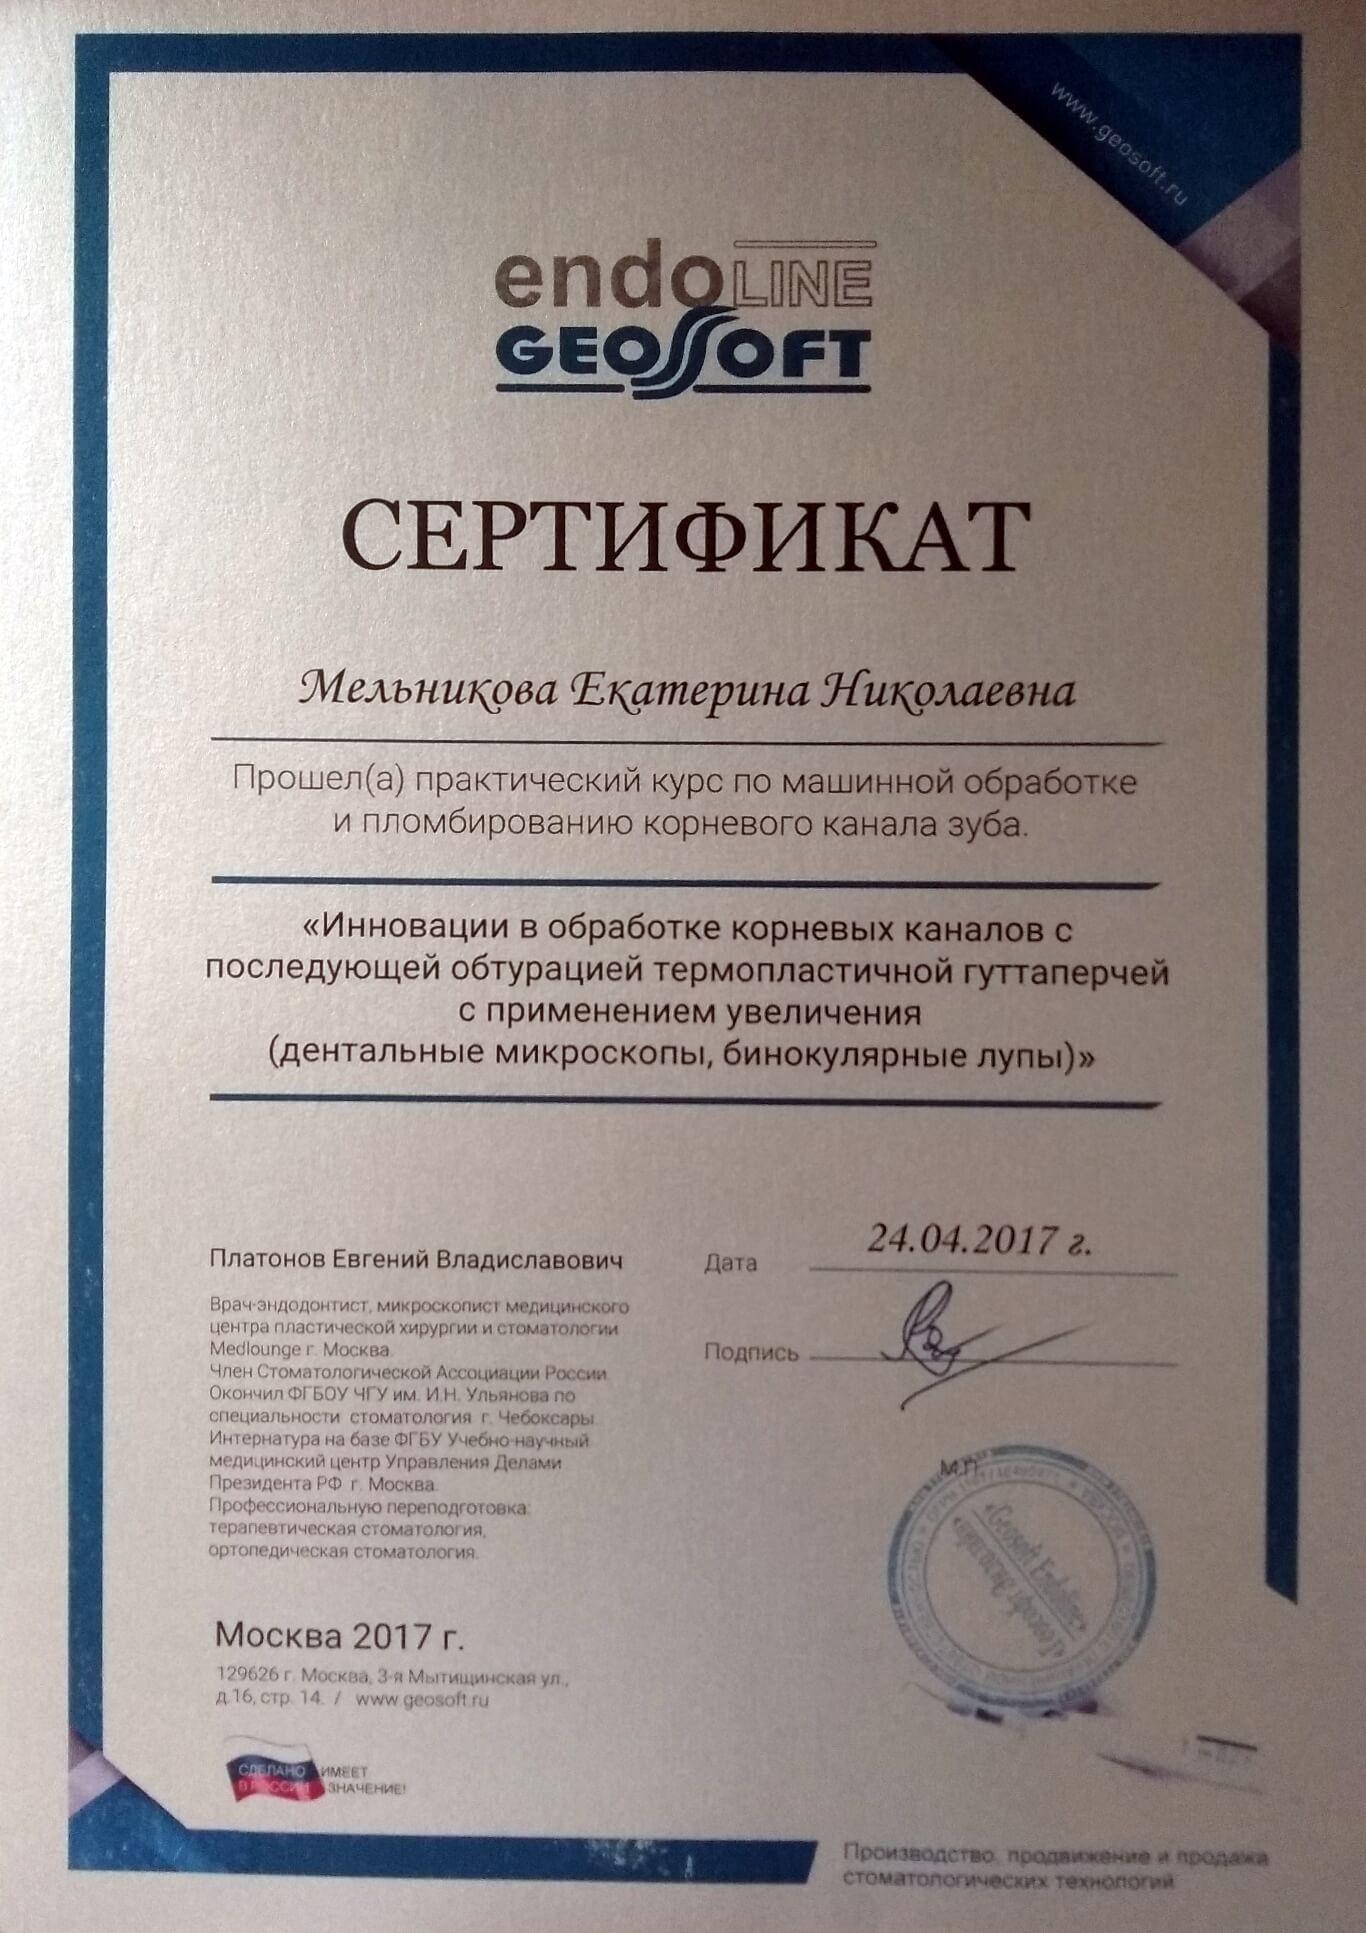 Куликова В. С. — сертификат №10